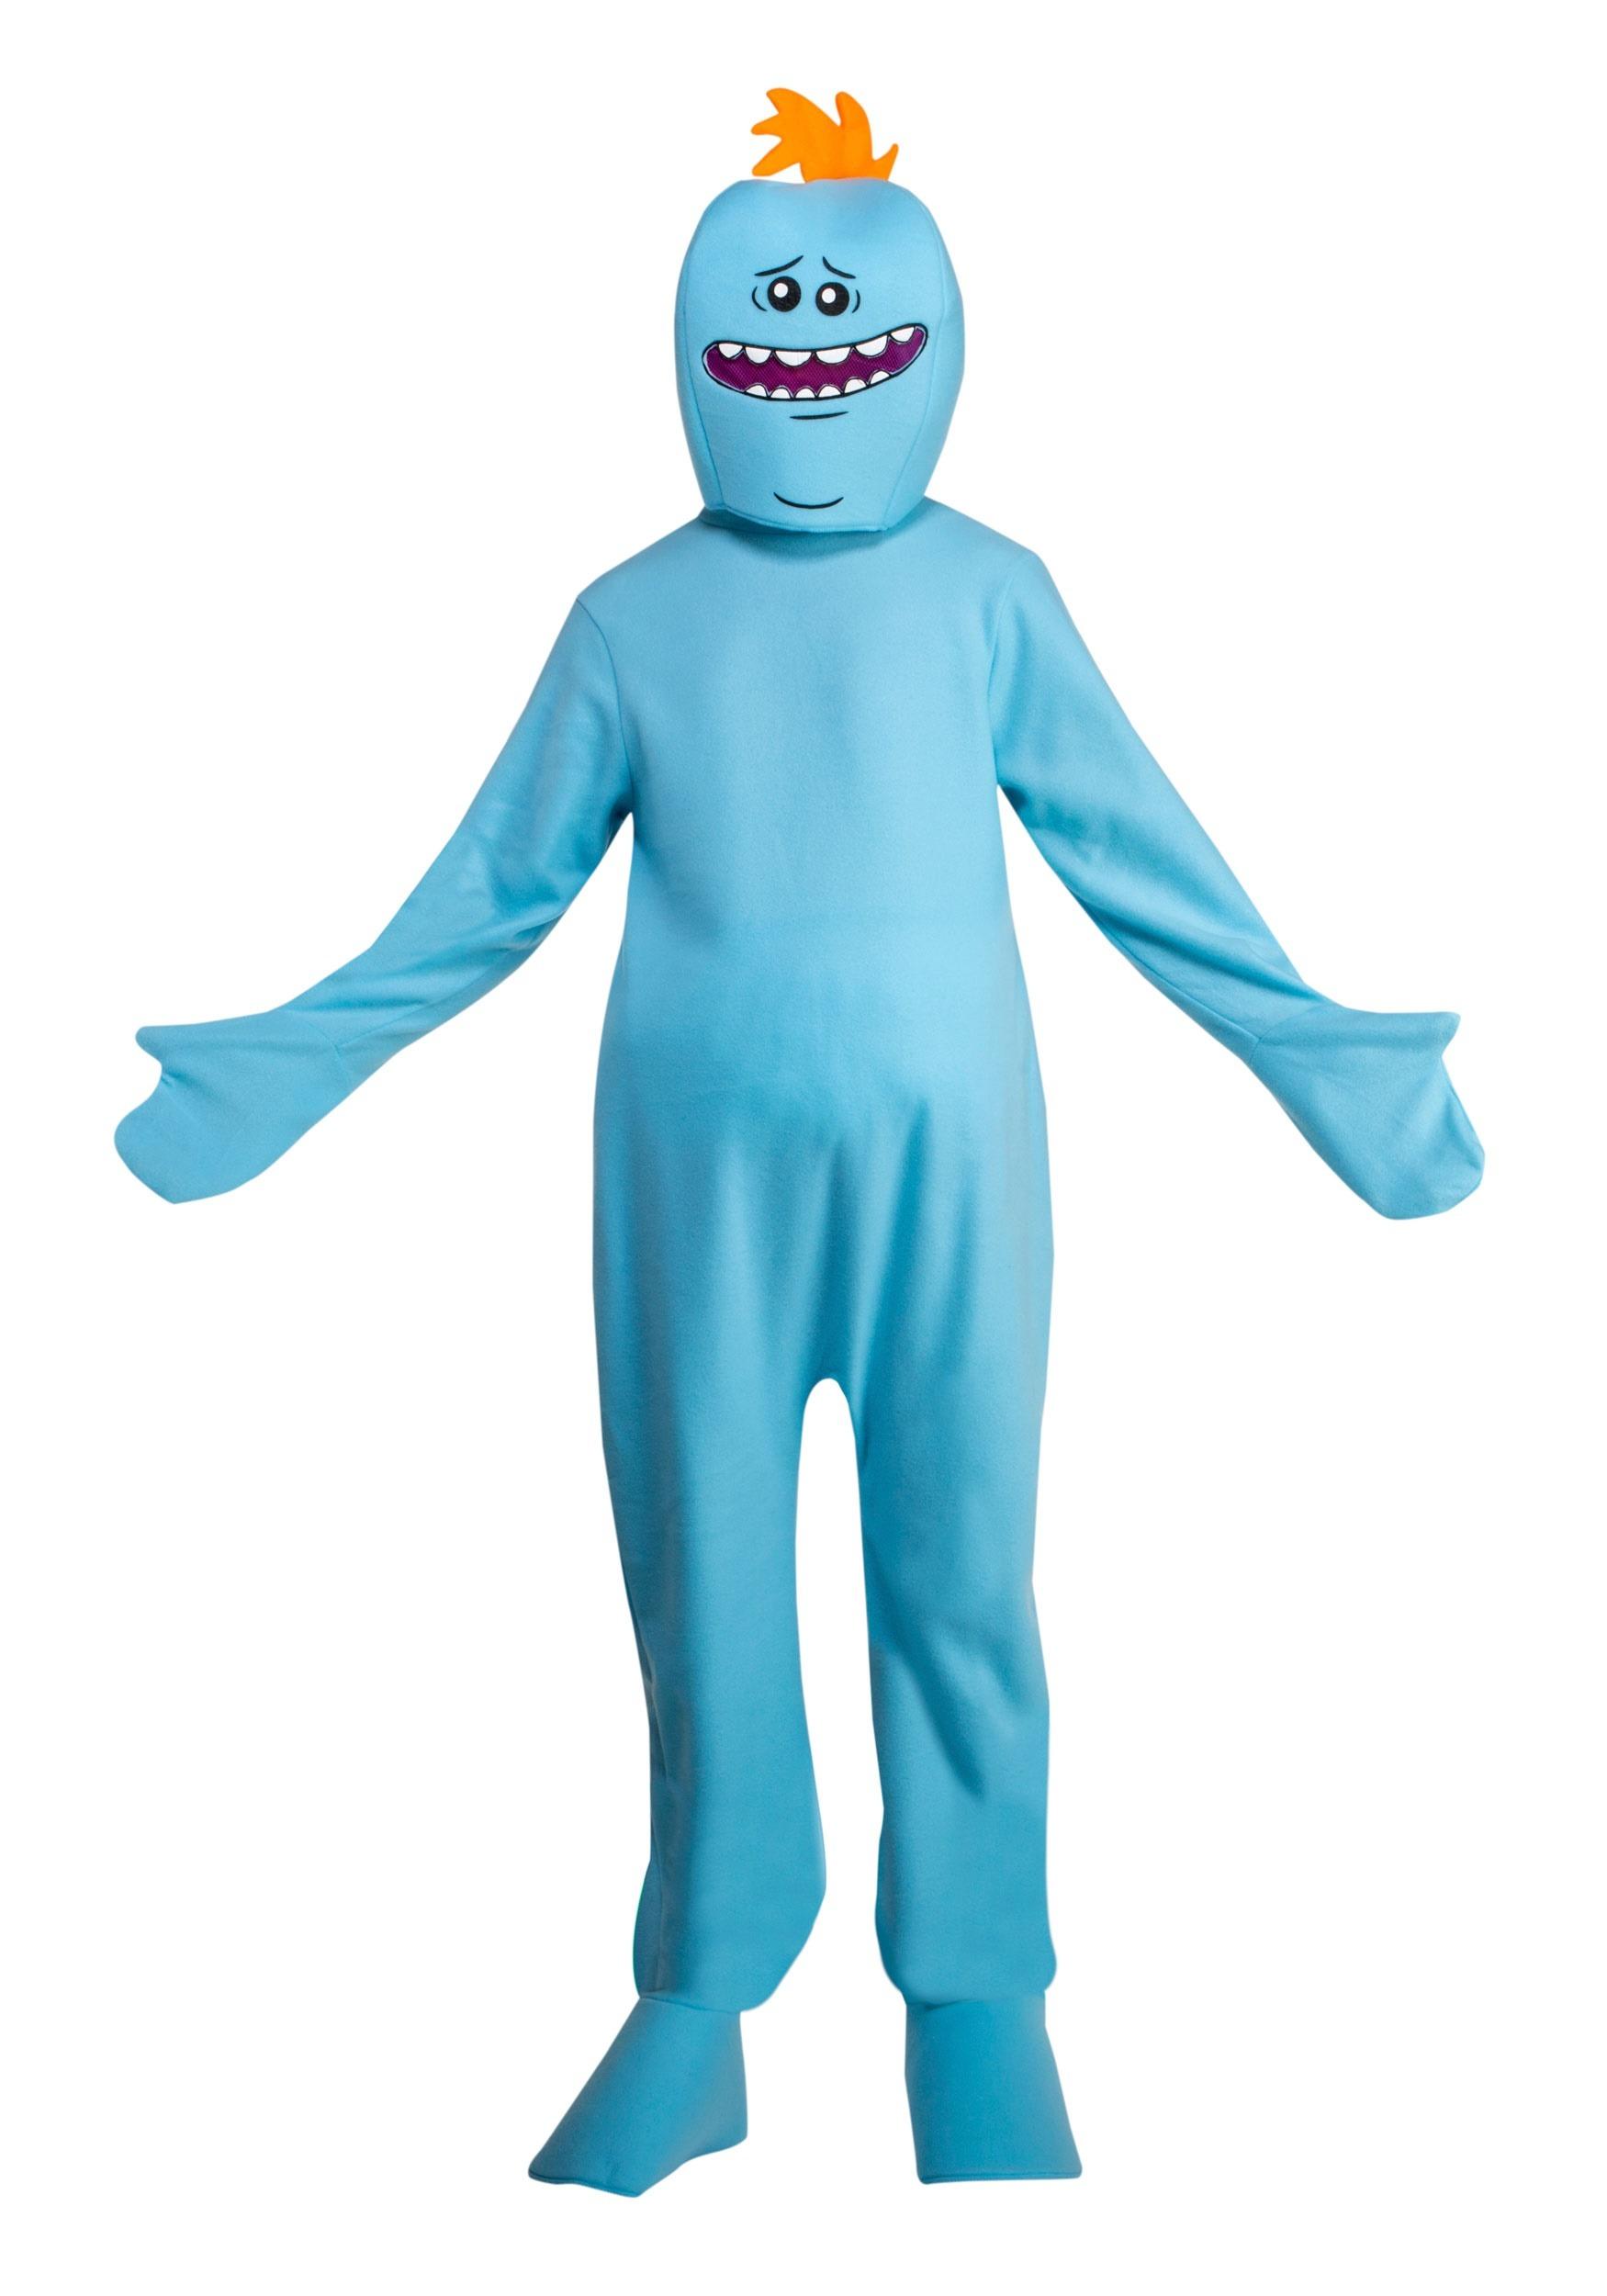 Mr. Meeseeks Rick and Morty Adult Costume